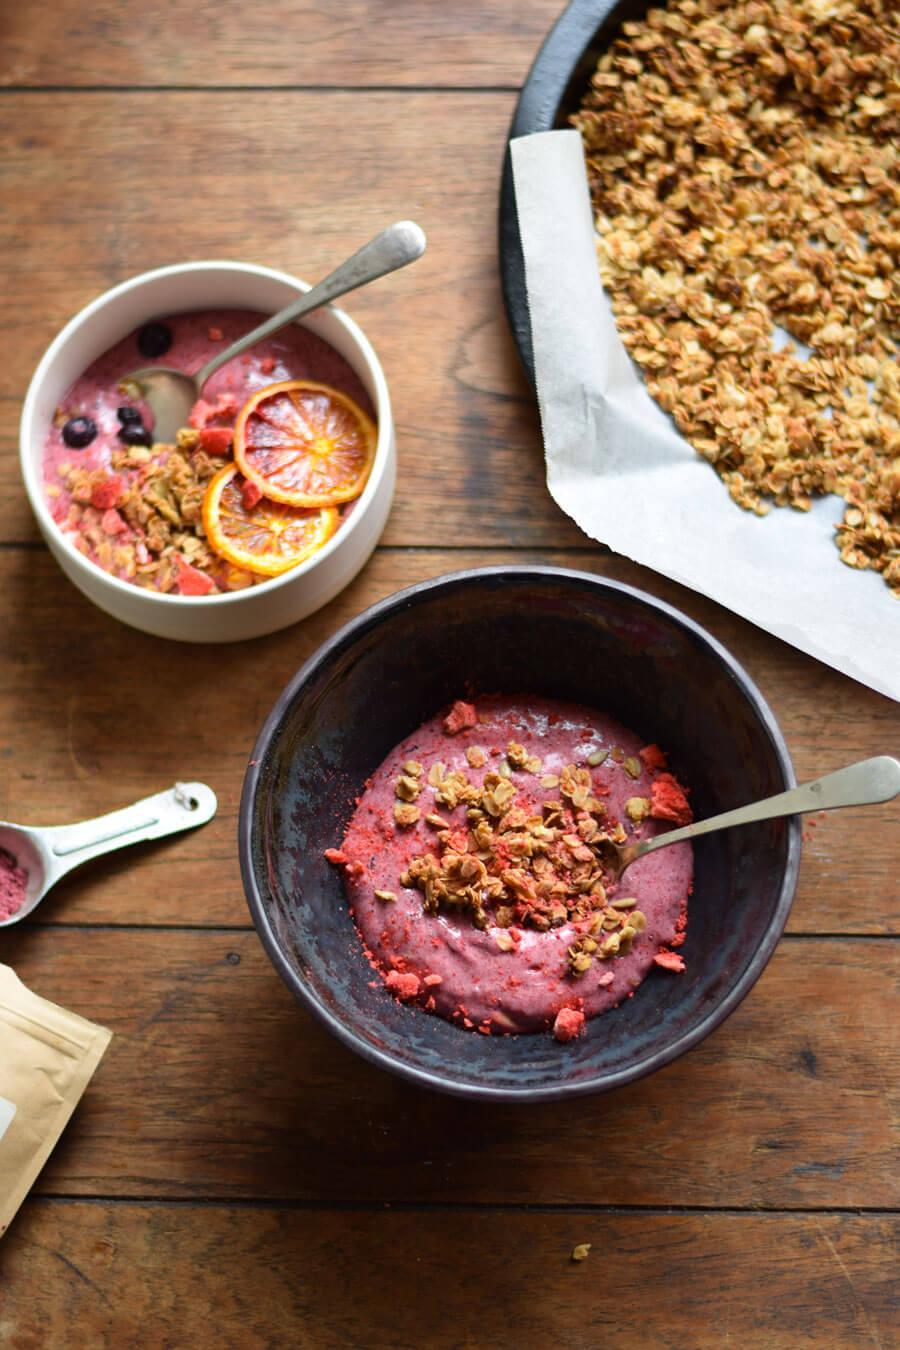 bare-berry-bowl-with-vanilla-wpi-long-2